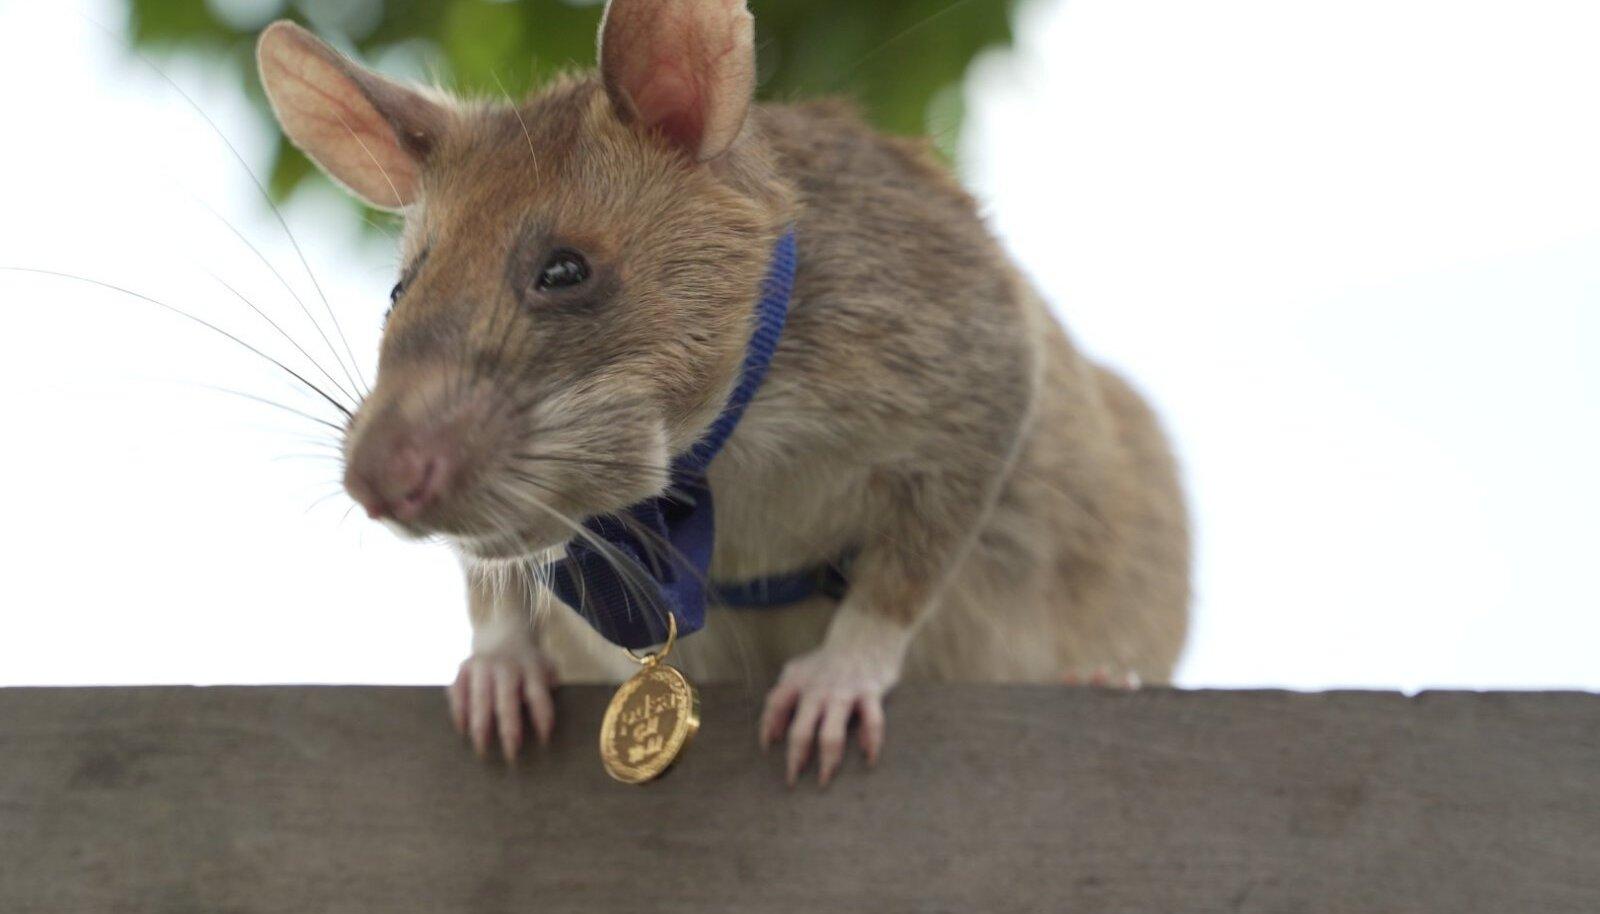 Magawa, jalaväemiine jahtiv rott